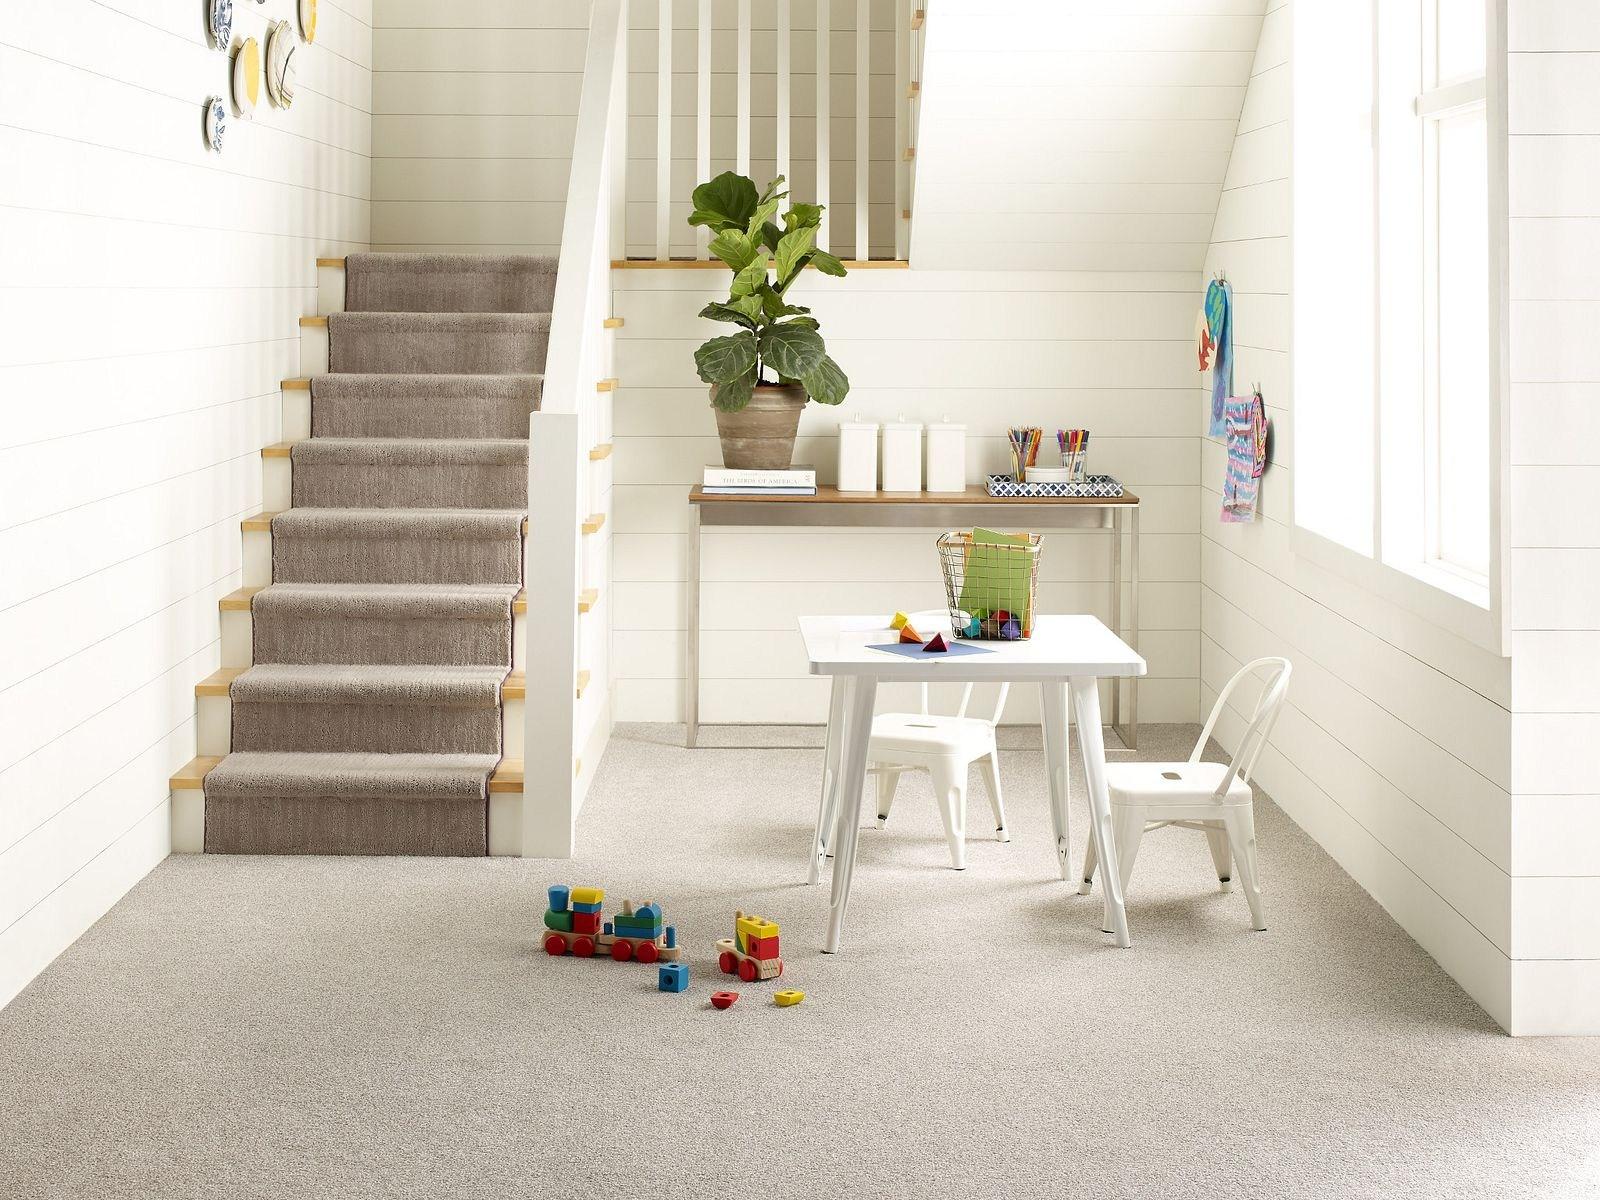 Carpet Carpeting Berber Texture More Shaw Floors   Industrial Carpet For Stairs   Shaw Floors   Persian Carpet   Stair Railing   Carpet Workroom   Handrail